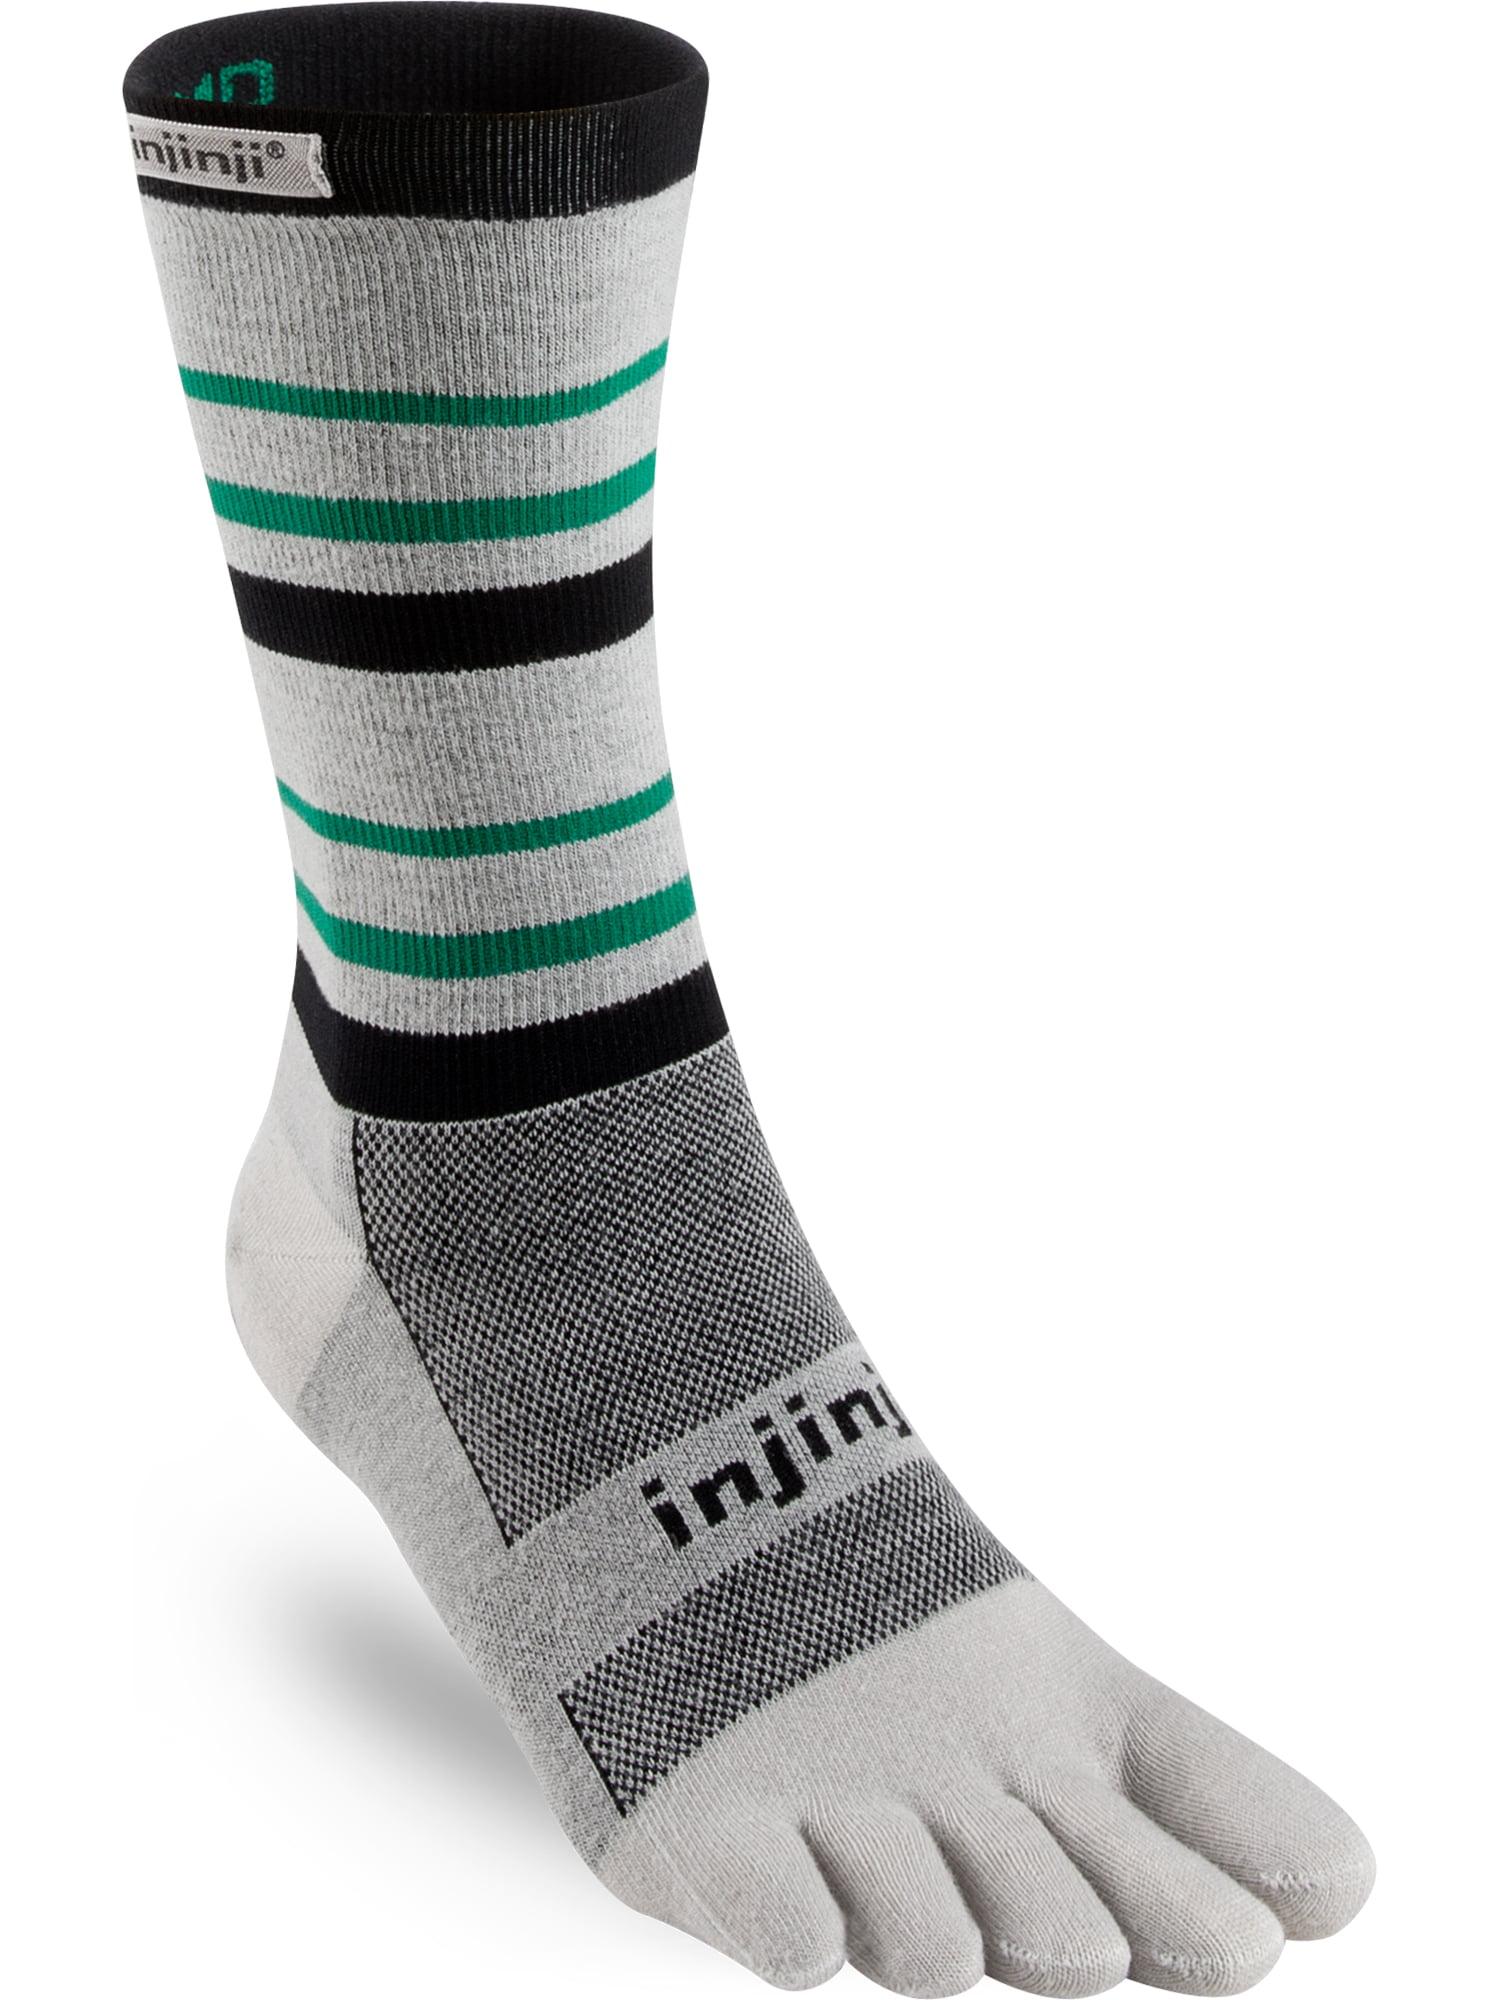 Injinji Run Lightweight Crew Socks